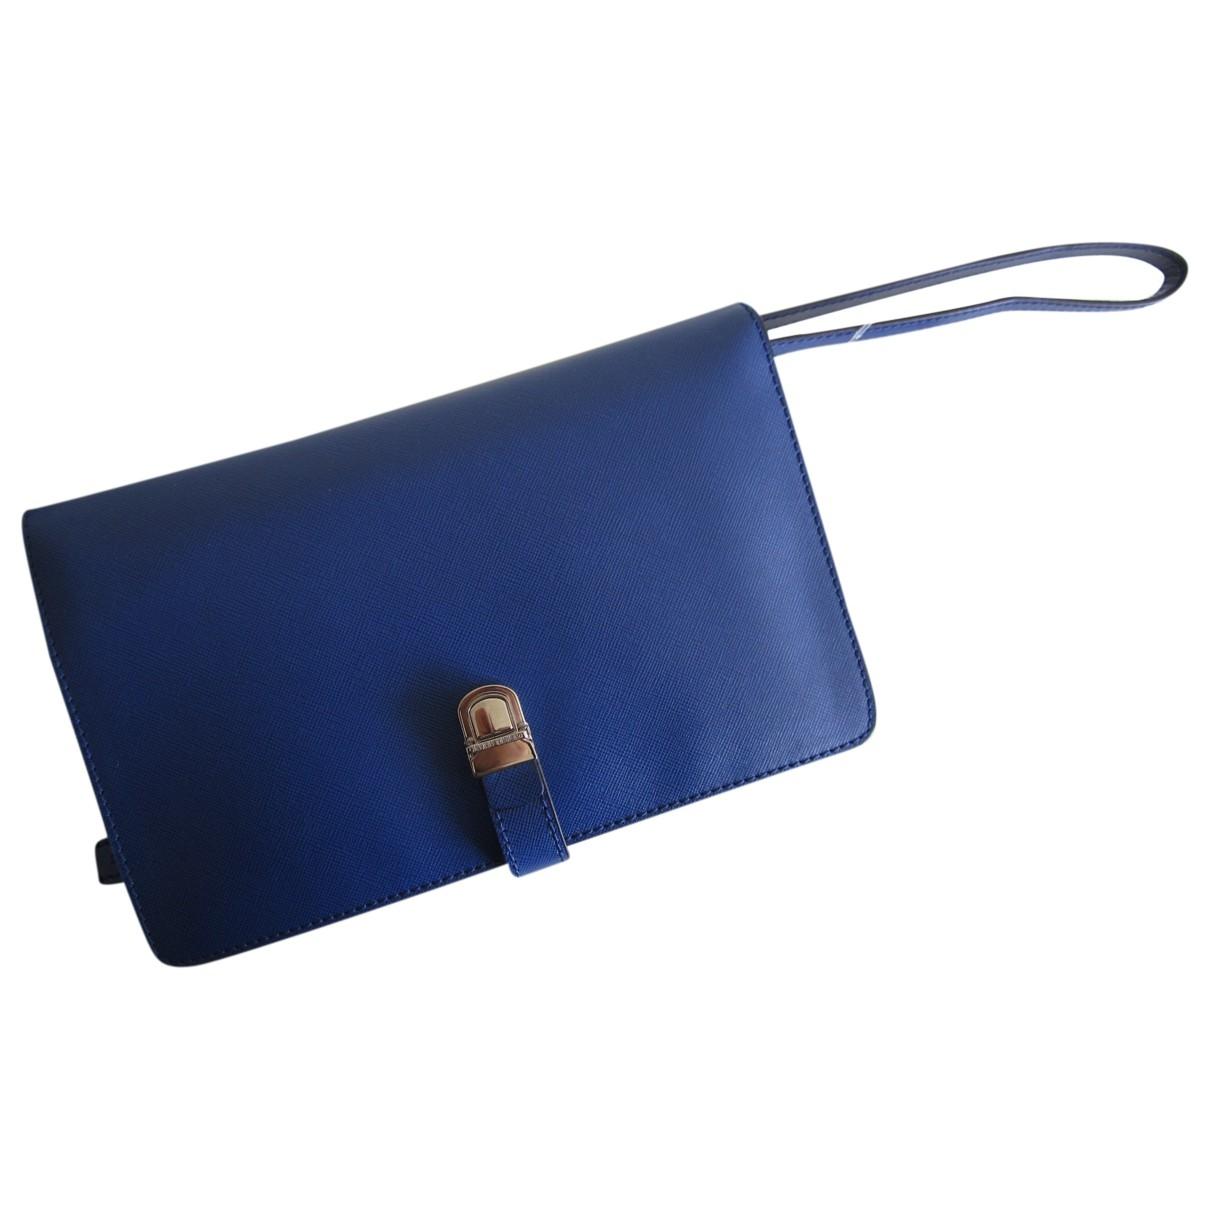 Giorgio Armani - Petite maroquinerie   pour homme en cuir - bleu